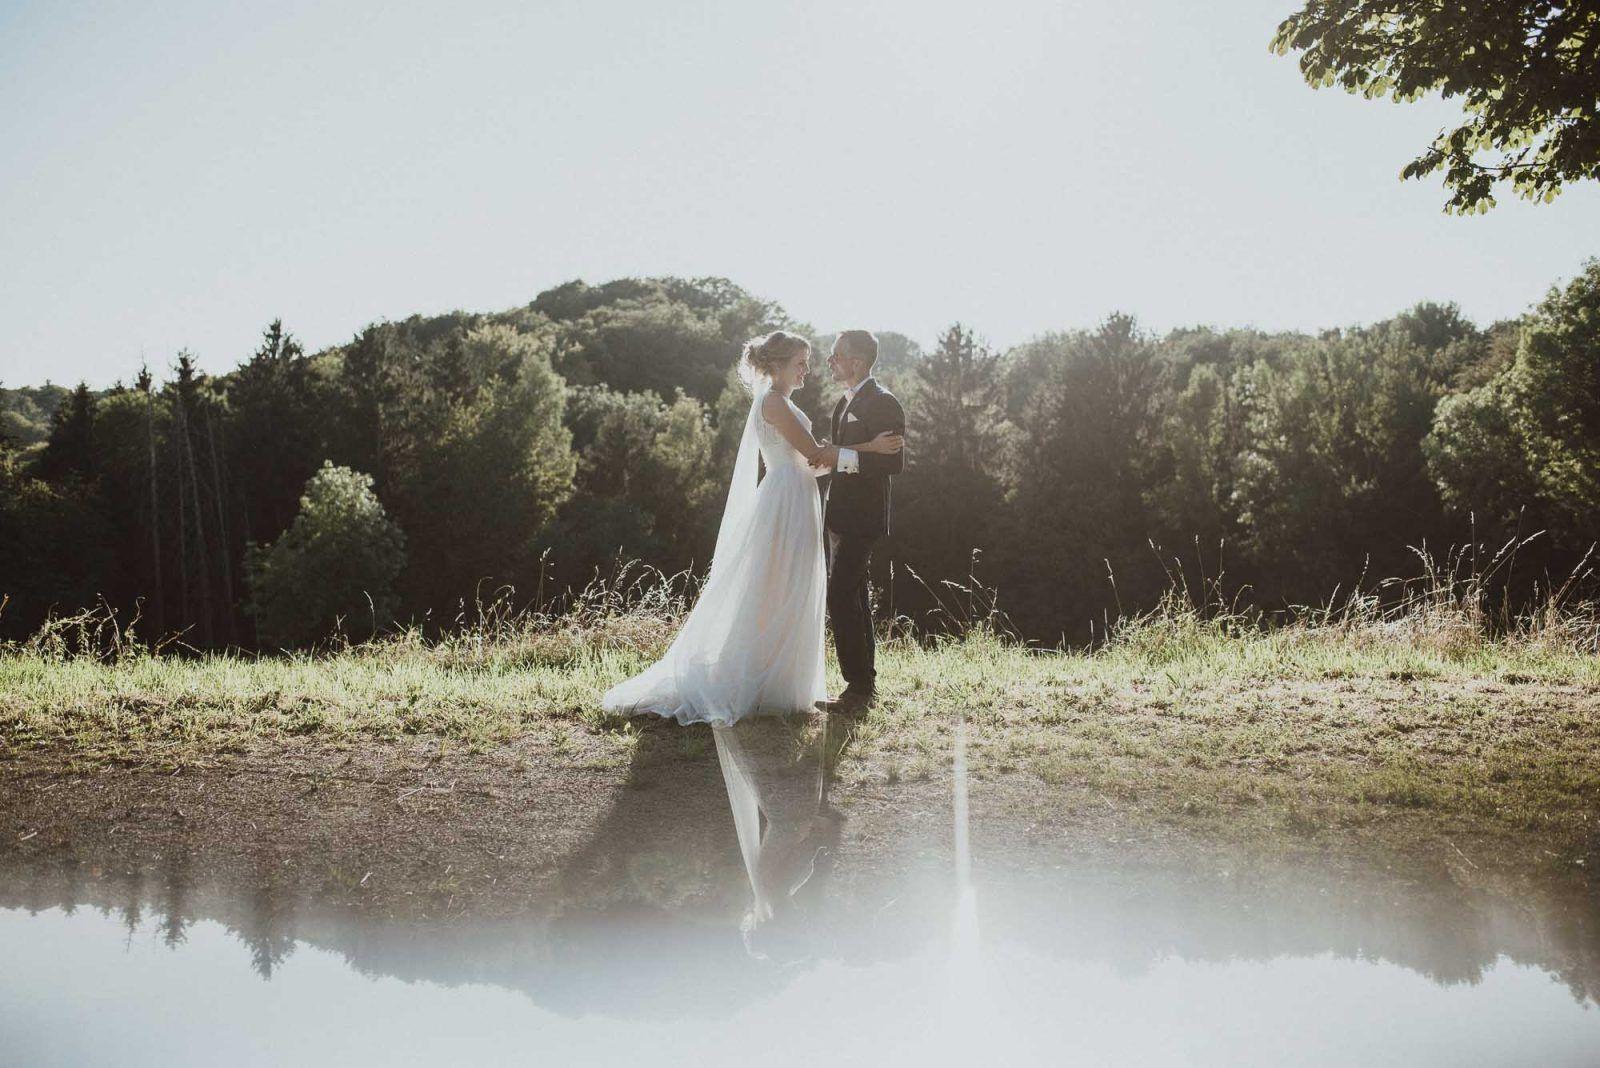 Hochzeitsfotograf Siegburg Fotograf Sven Palm AP